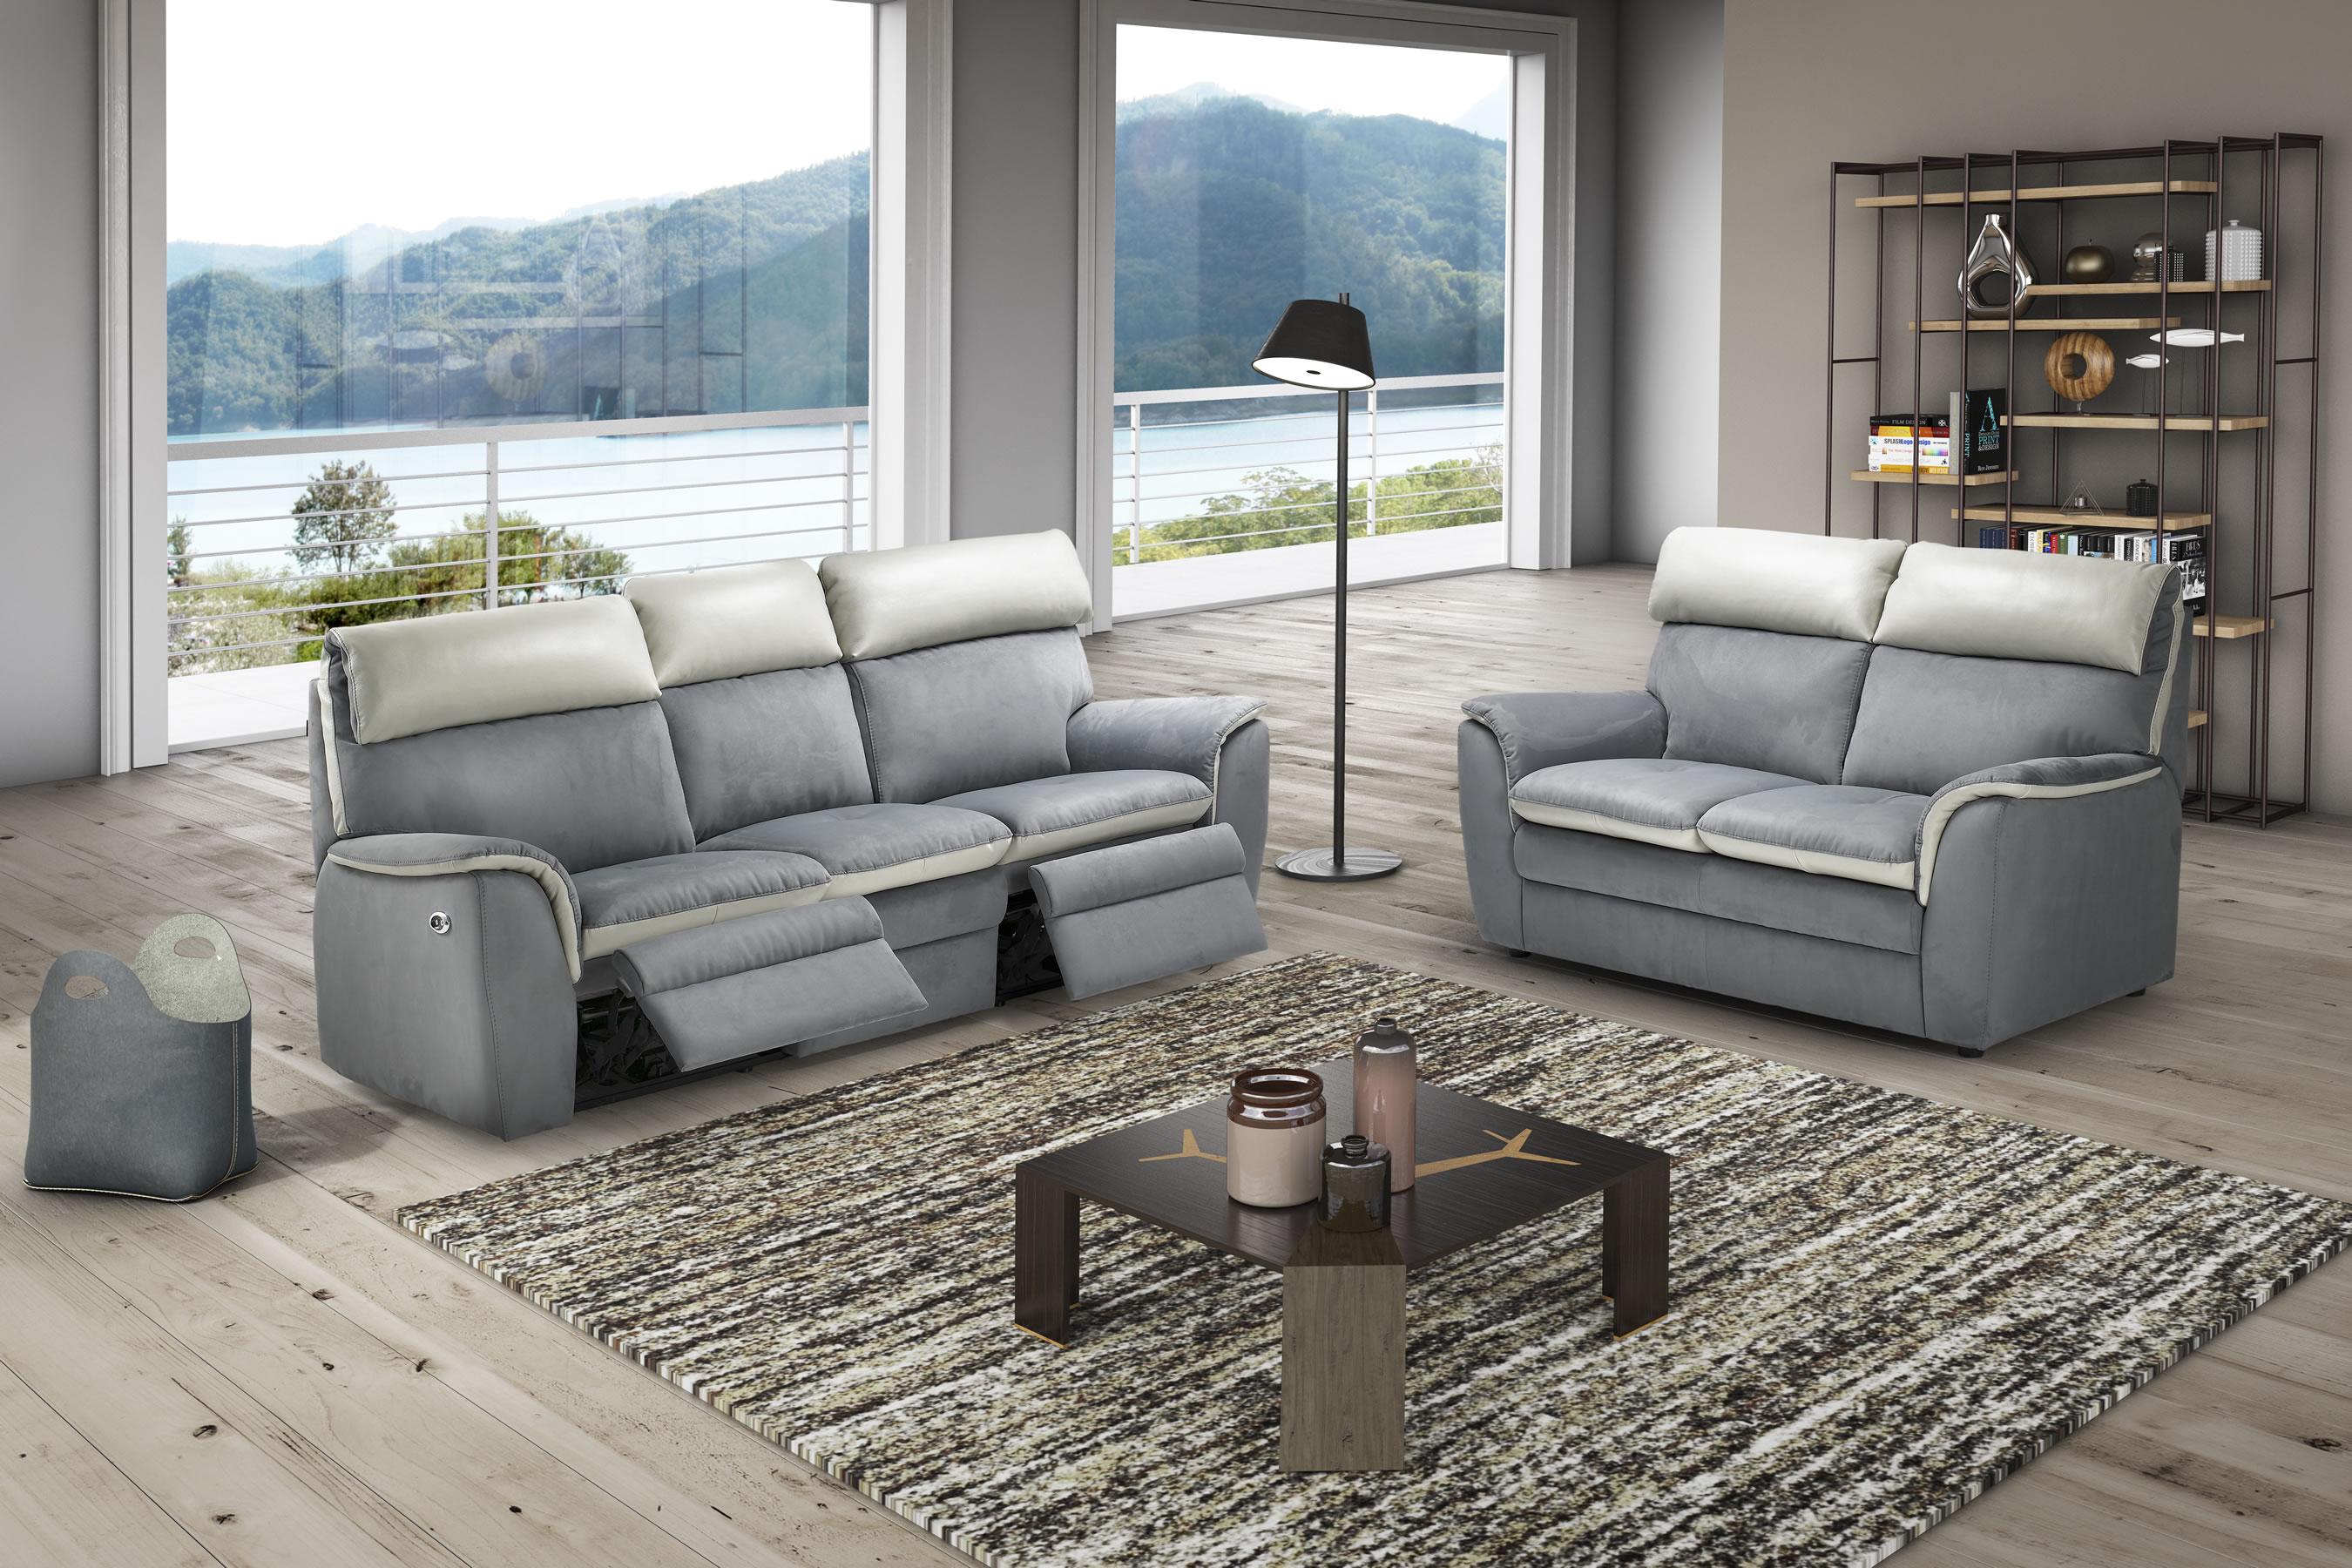 Italia Living Divani.Italia Living Production Sofas Armchairs Sectional